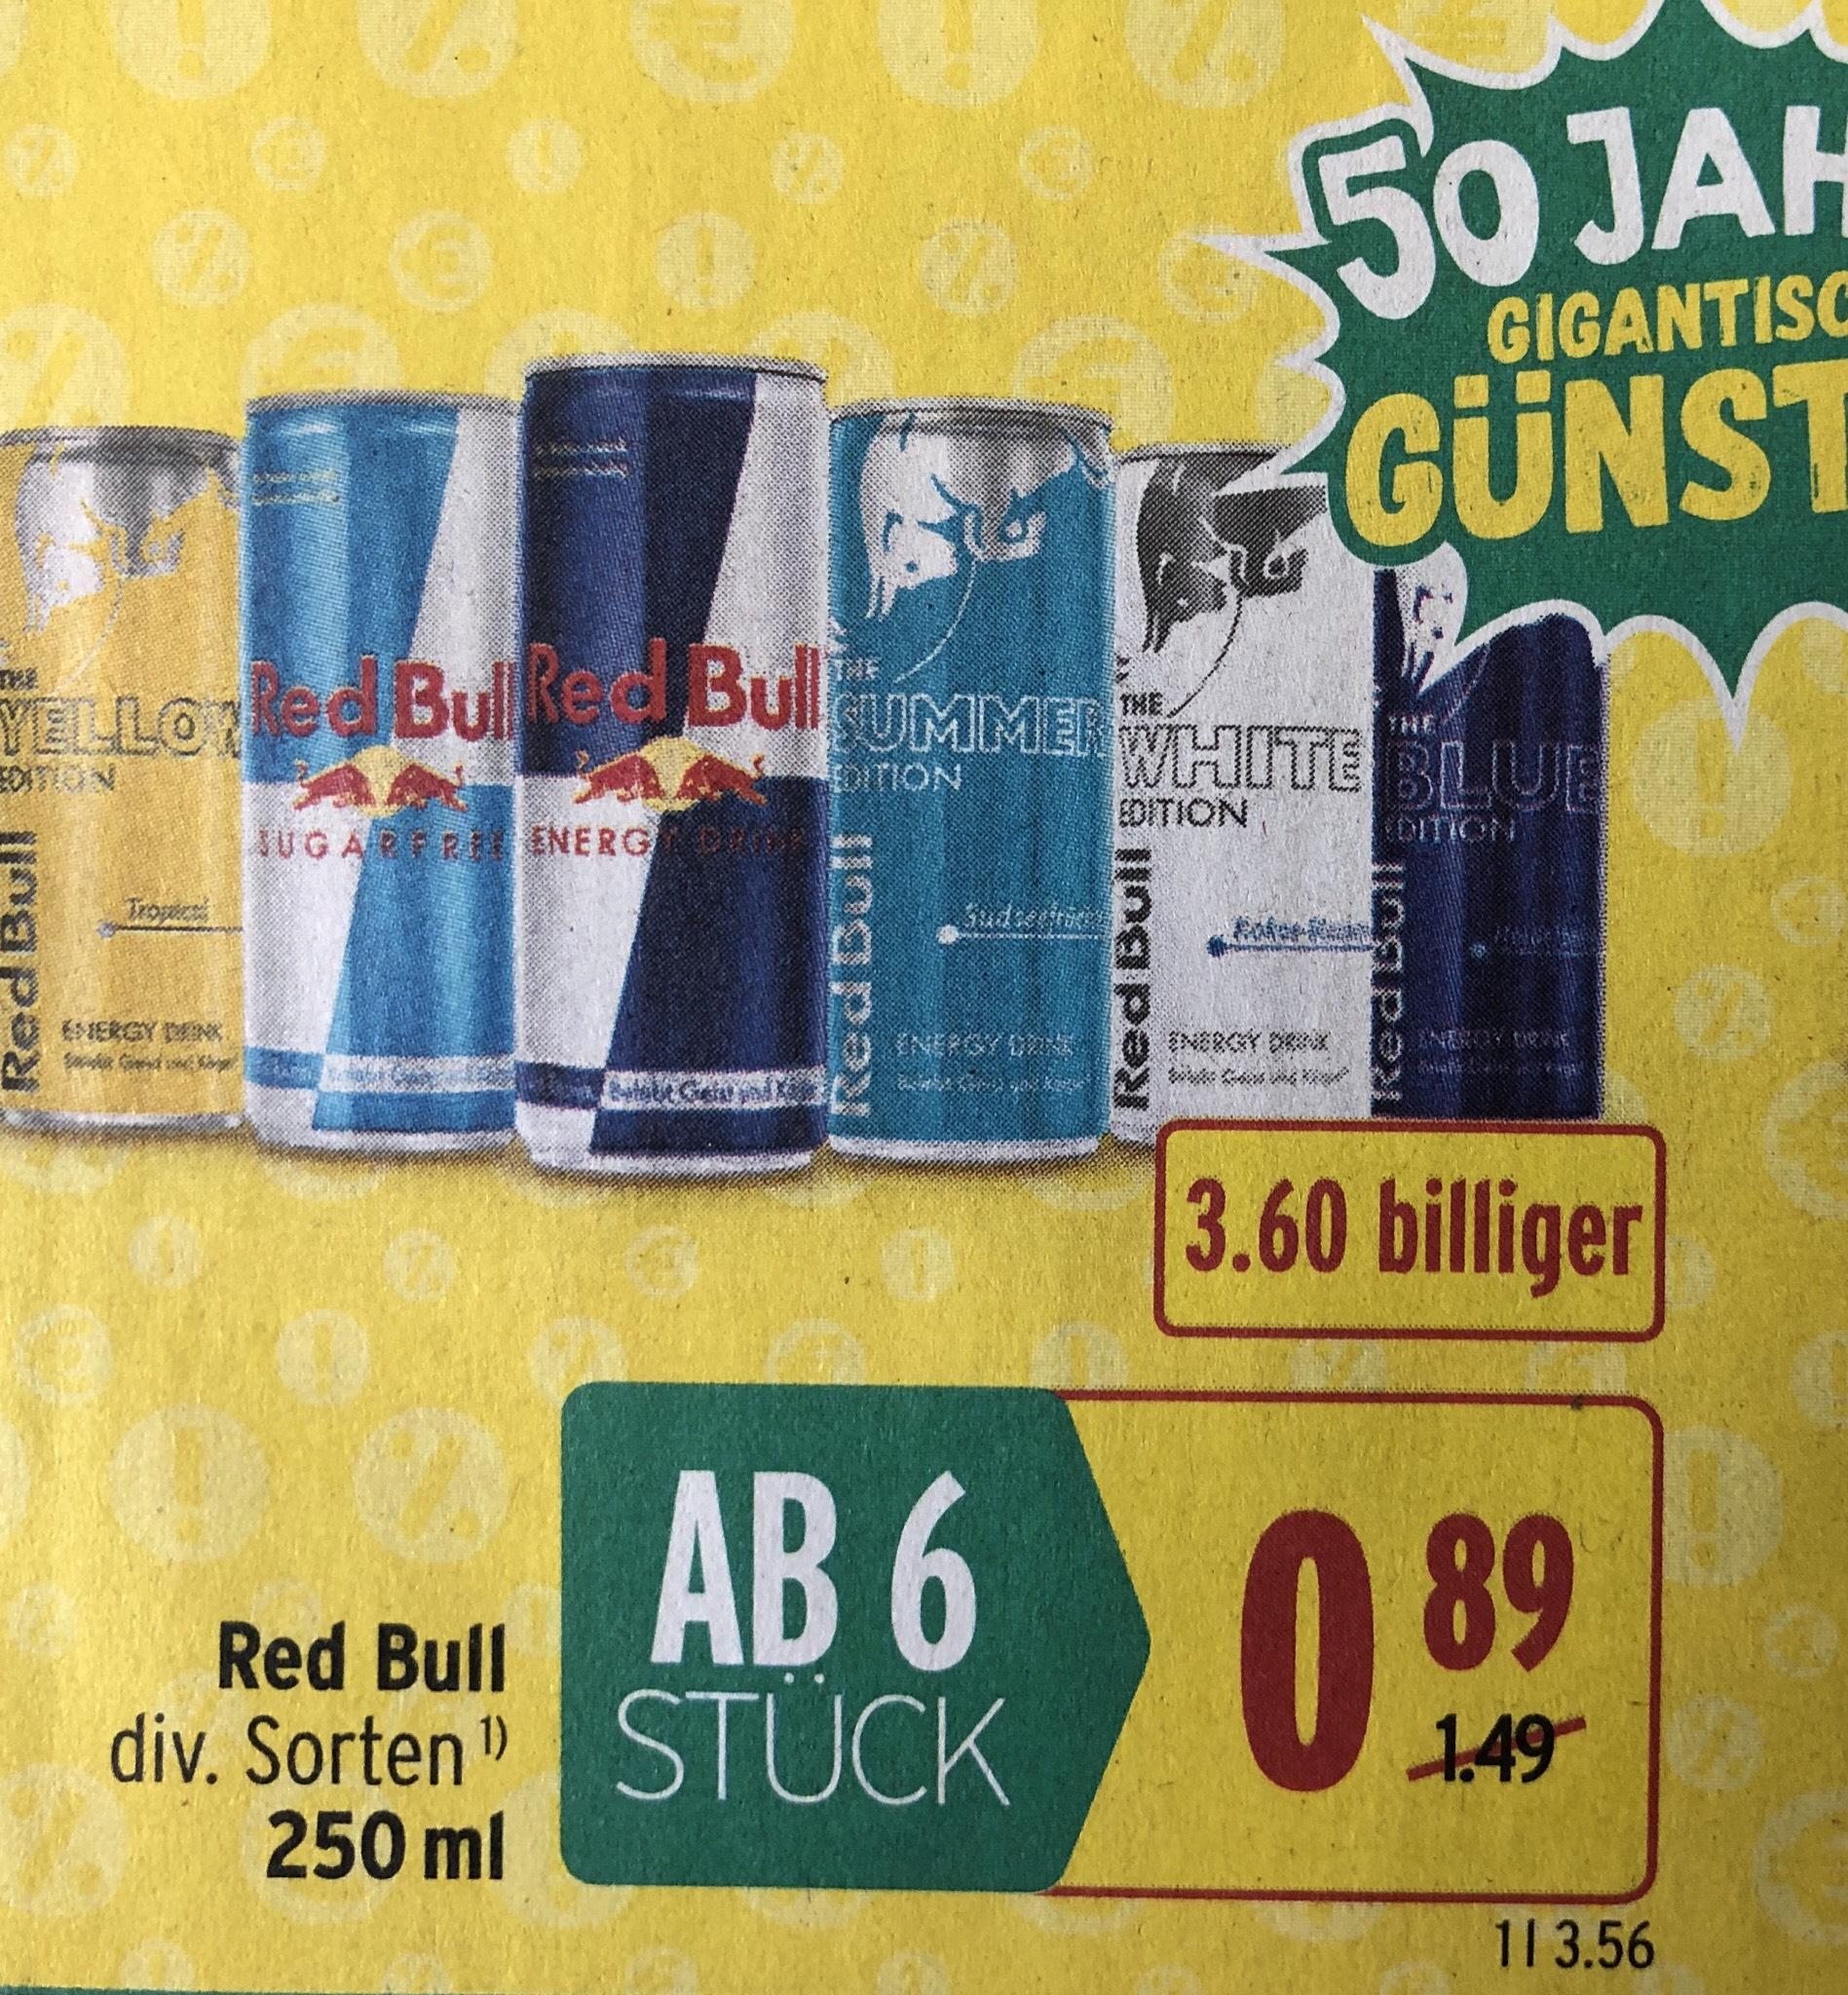 Red Bull um nur € 0,89 (ab 6 Stk.)